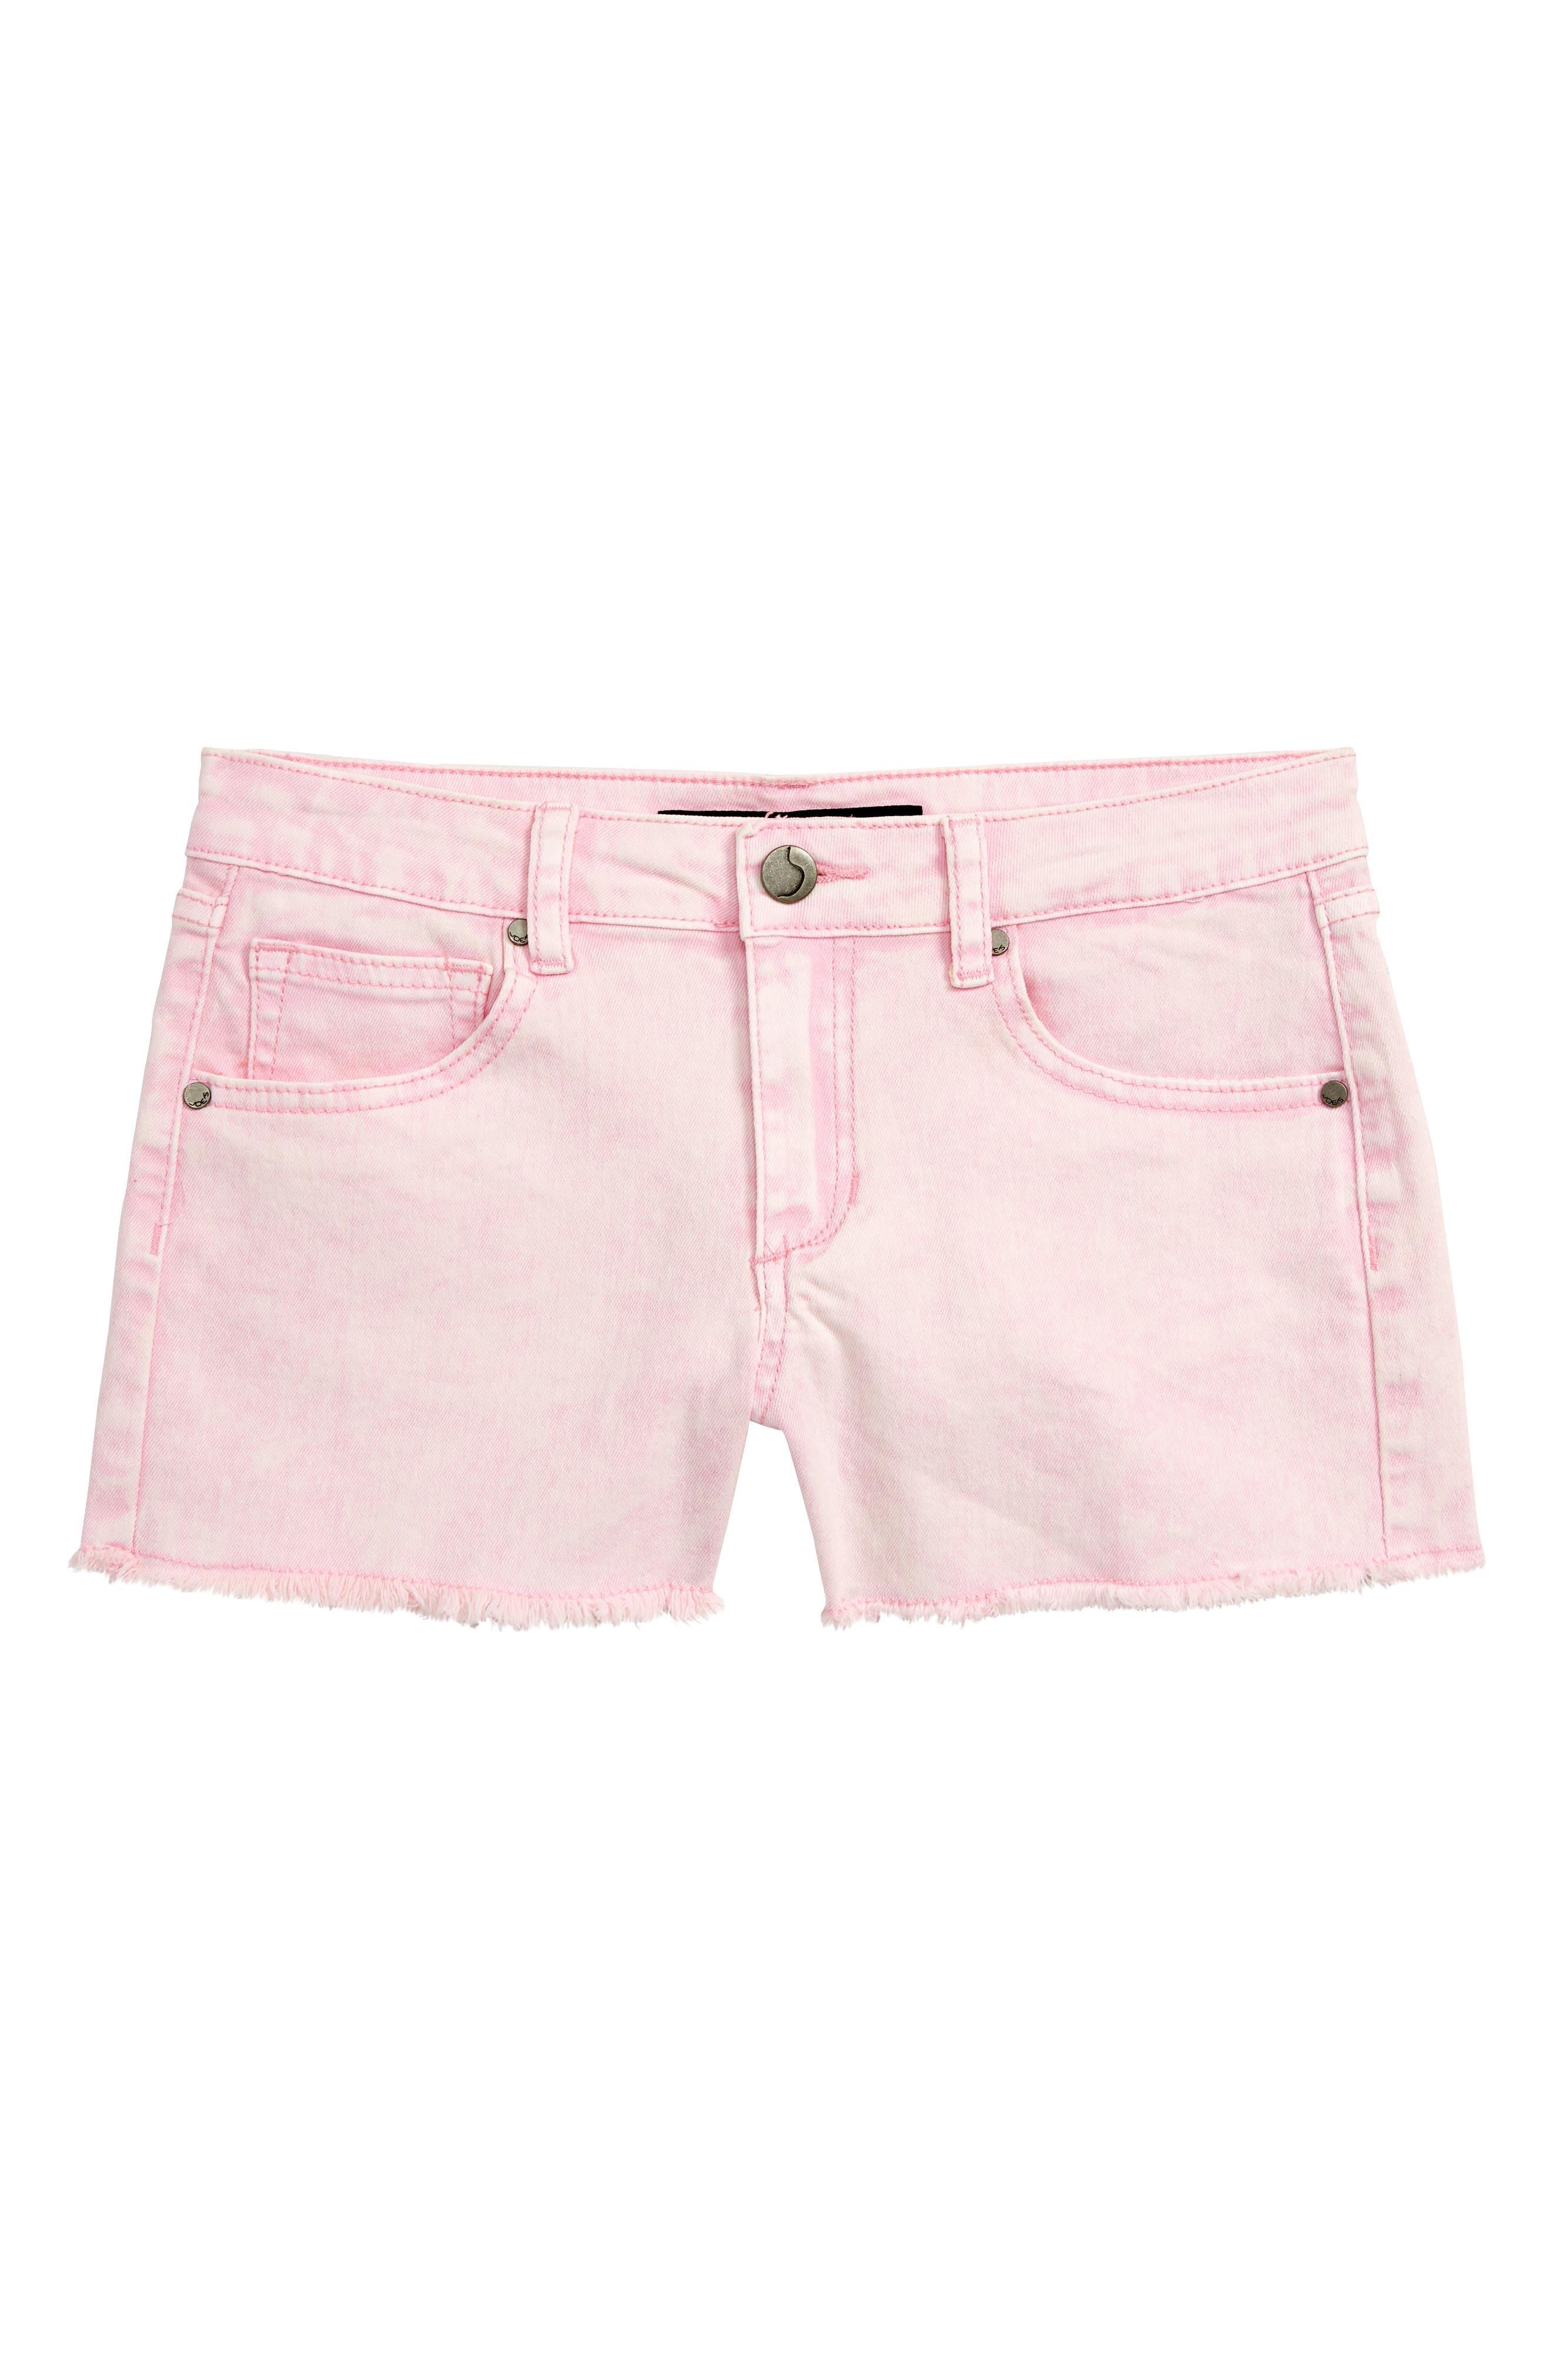 JOE'S The Markie Cutoff Denim Shorts, Main, color, PRISM PINK